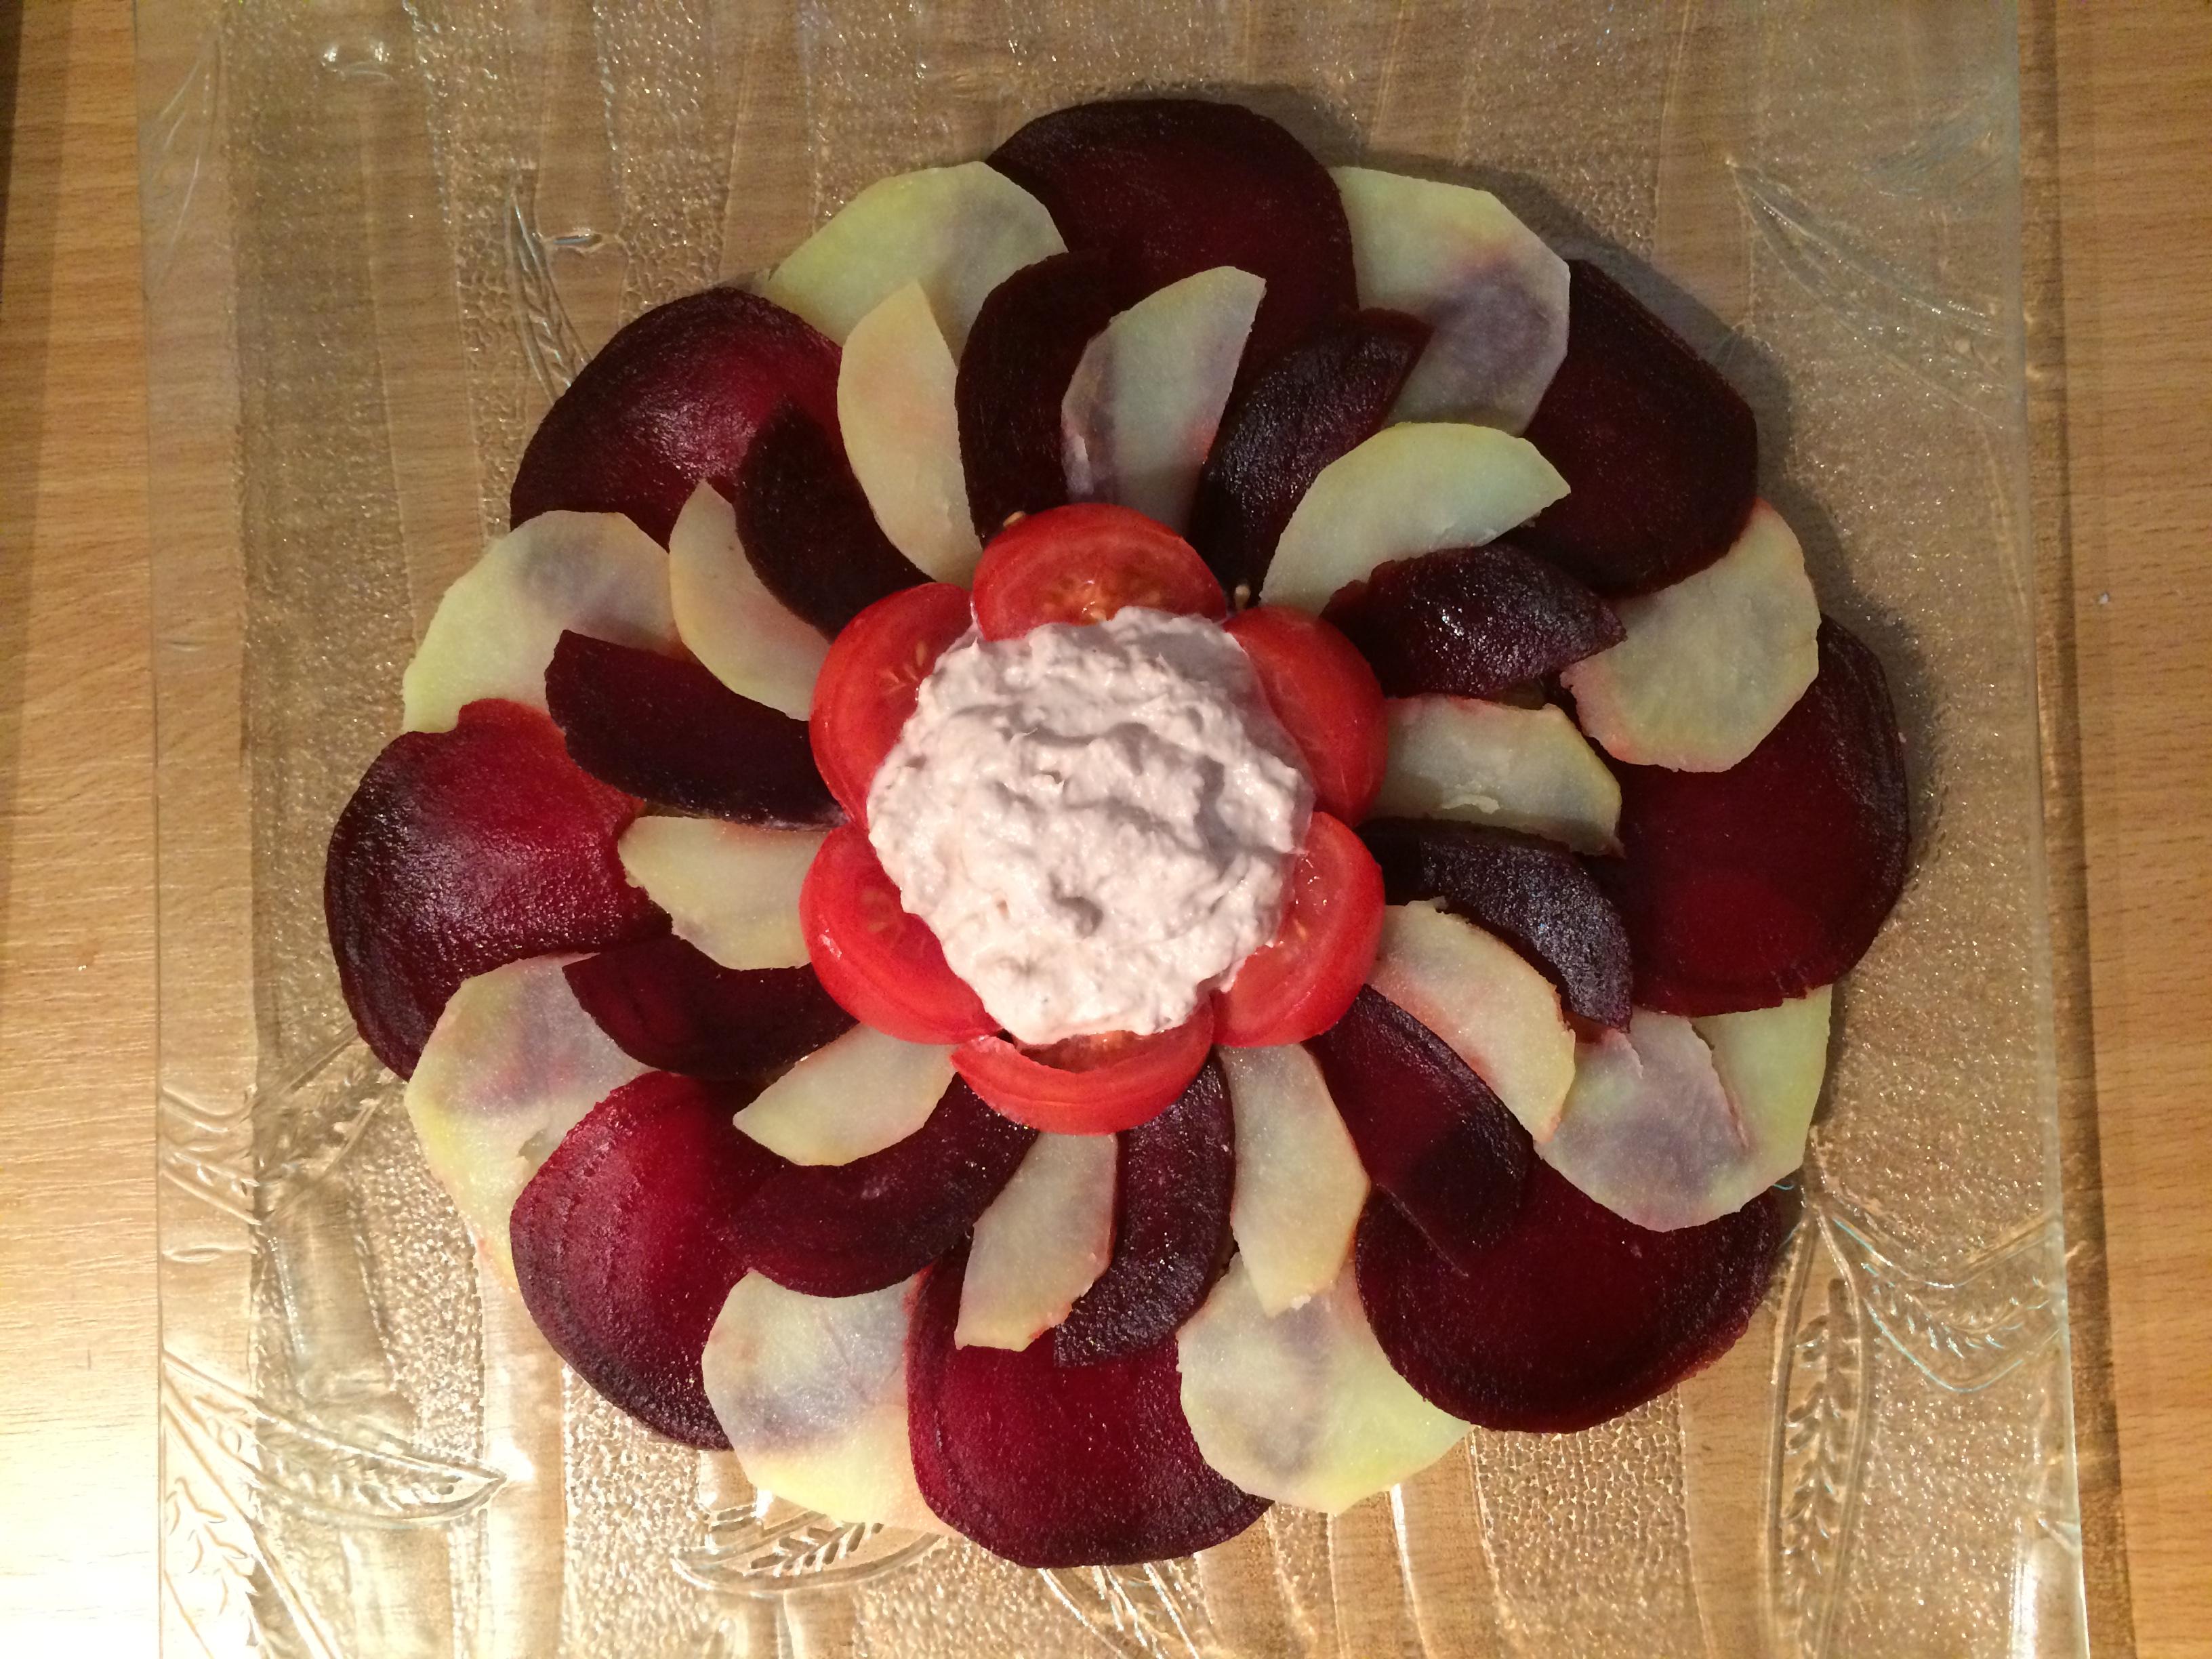 salade thon betteraves tomates pommes de terre sorosebonbons. Black Bedroom Furniture Sets. Home Design Ideas